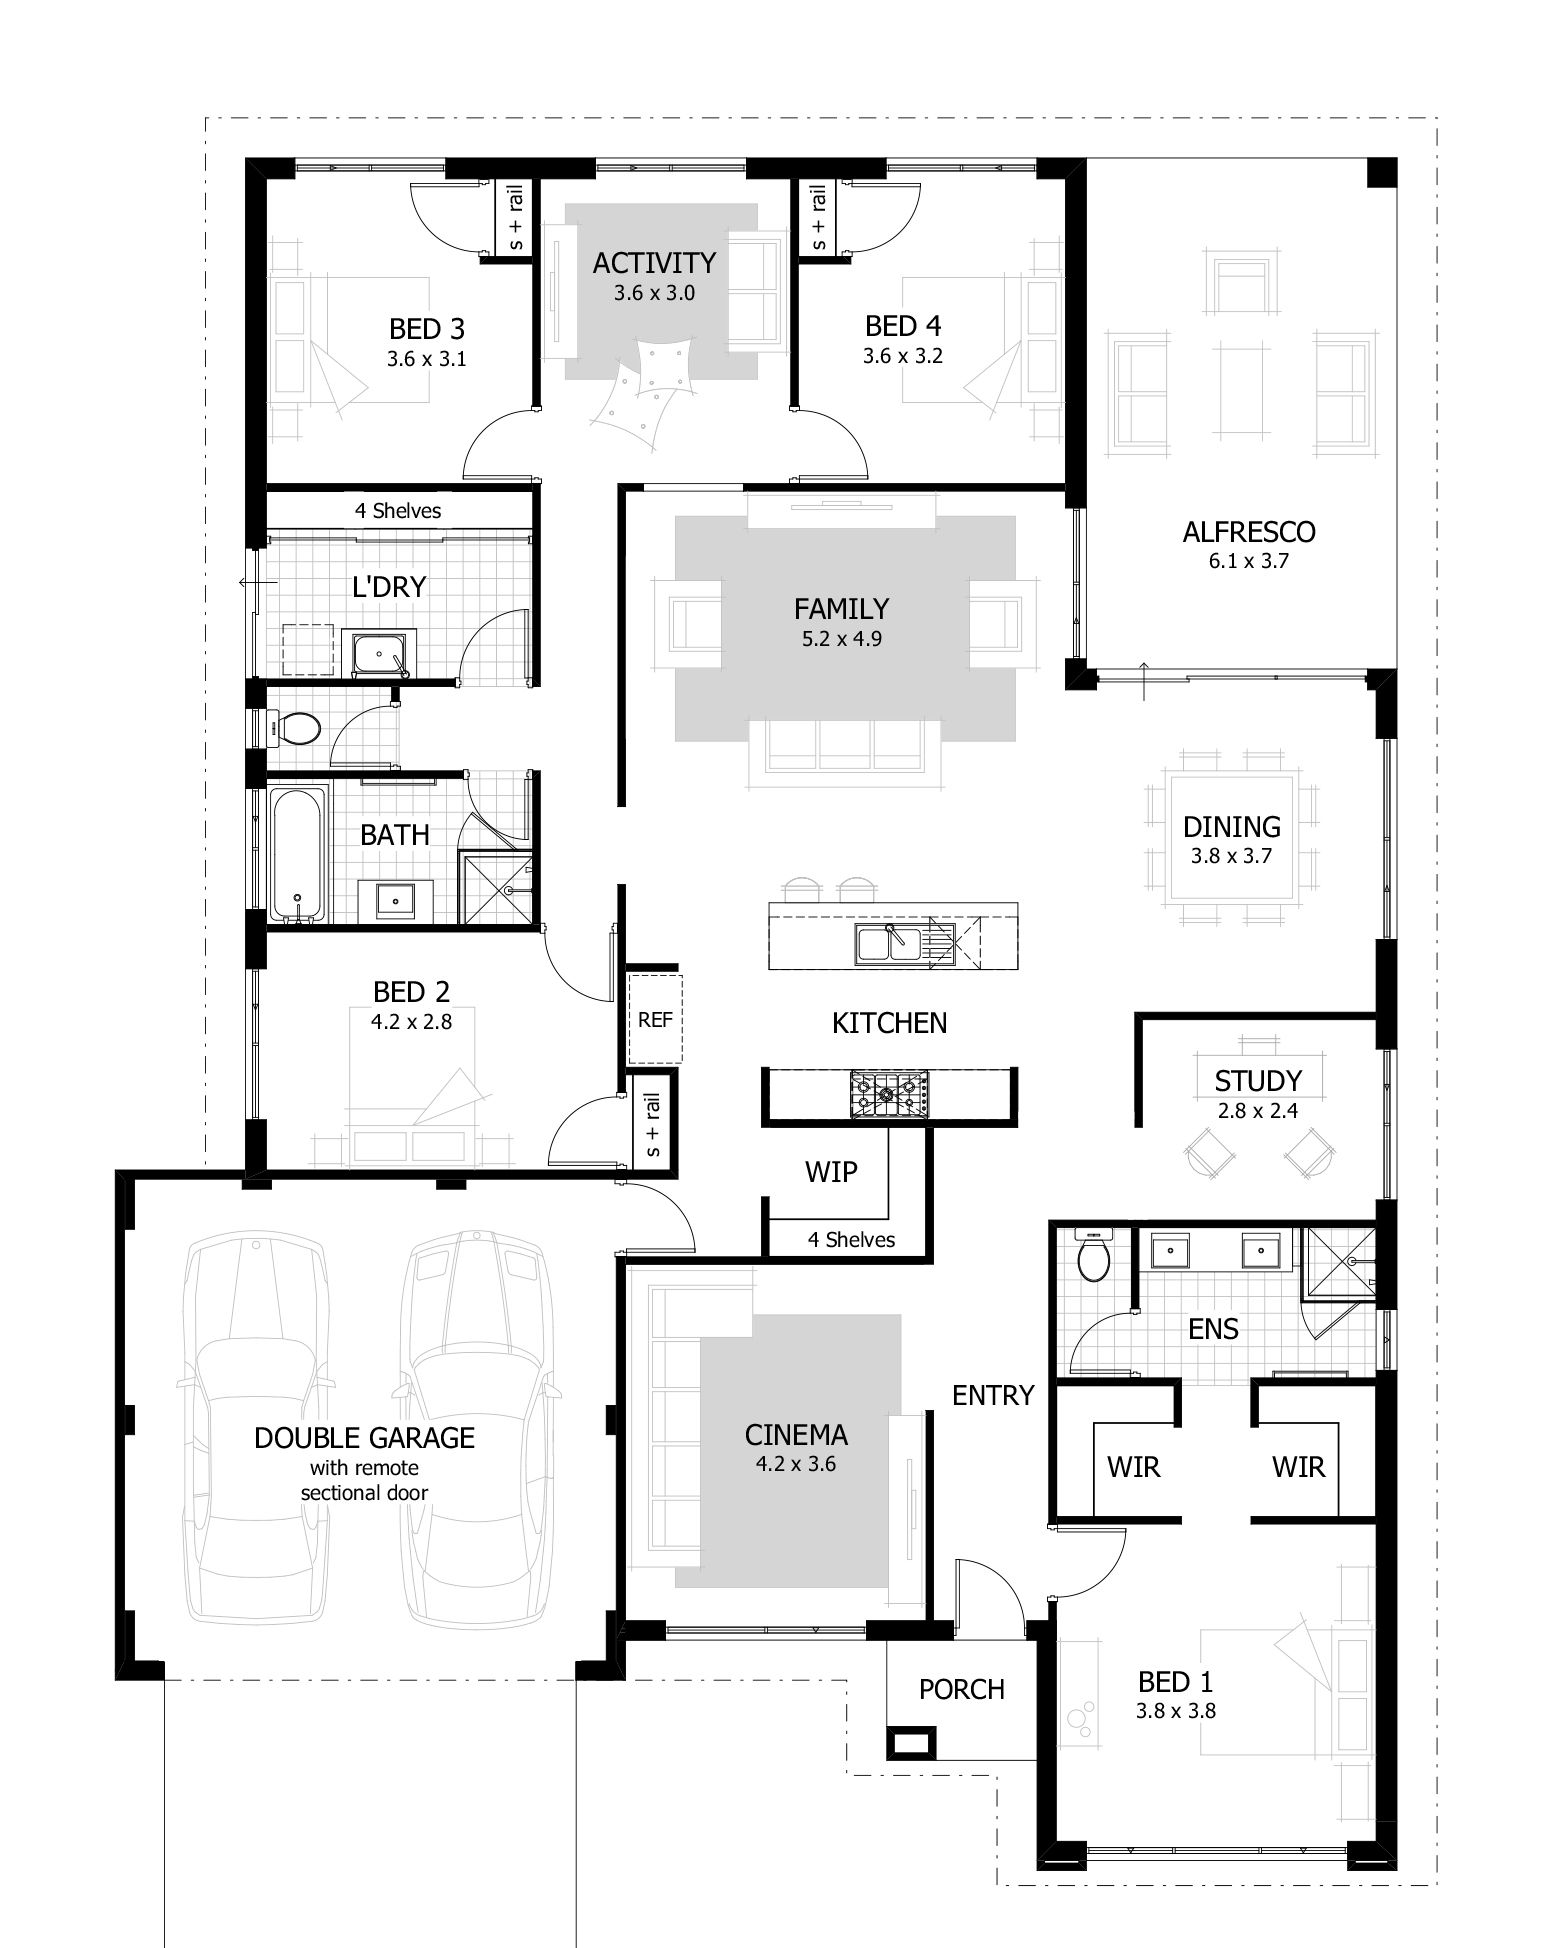 Bedroom House Plans Amp Home Designs Celebration Homes Floor New - 4 bedroom townhouse designs